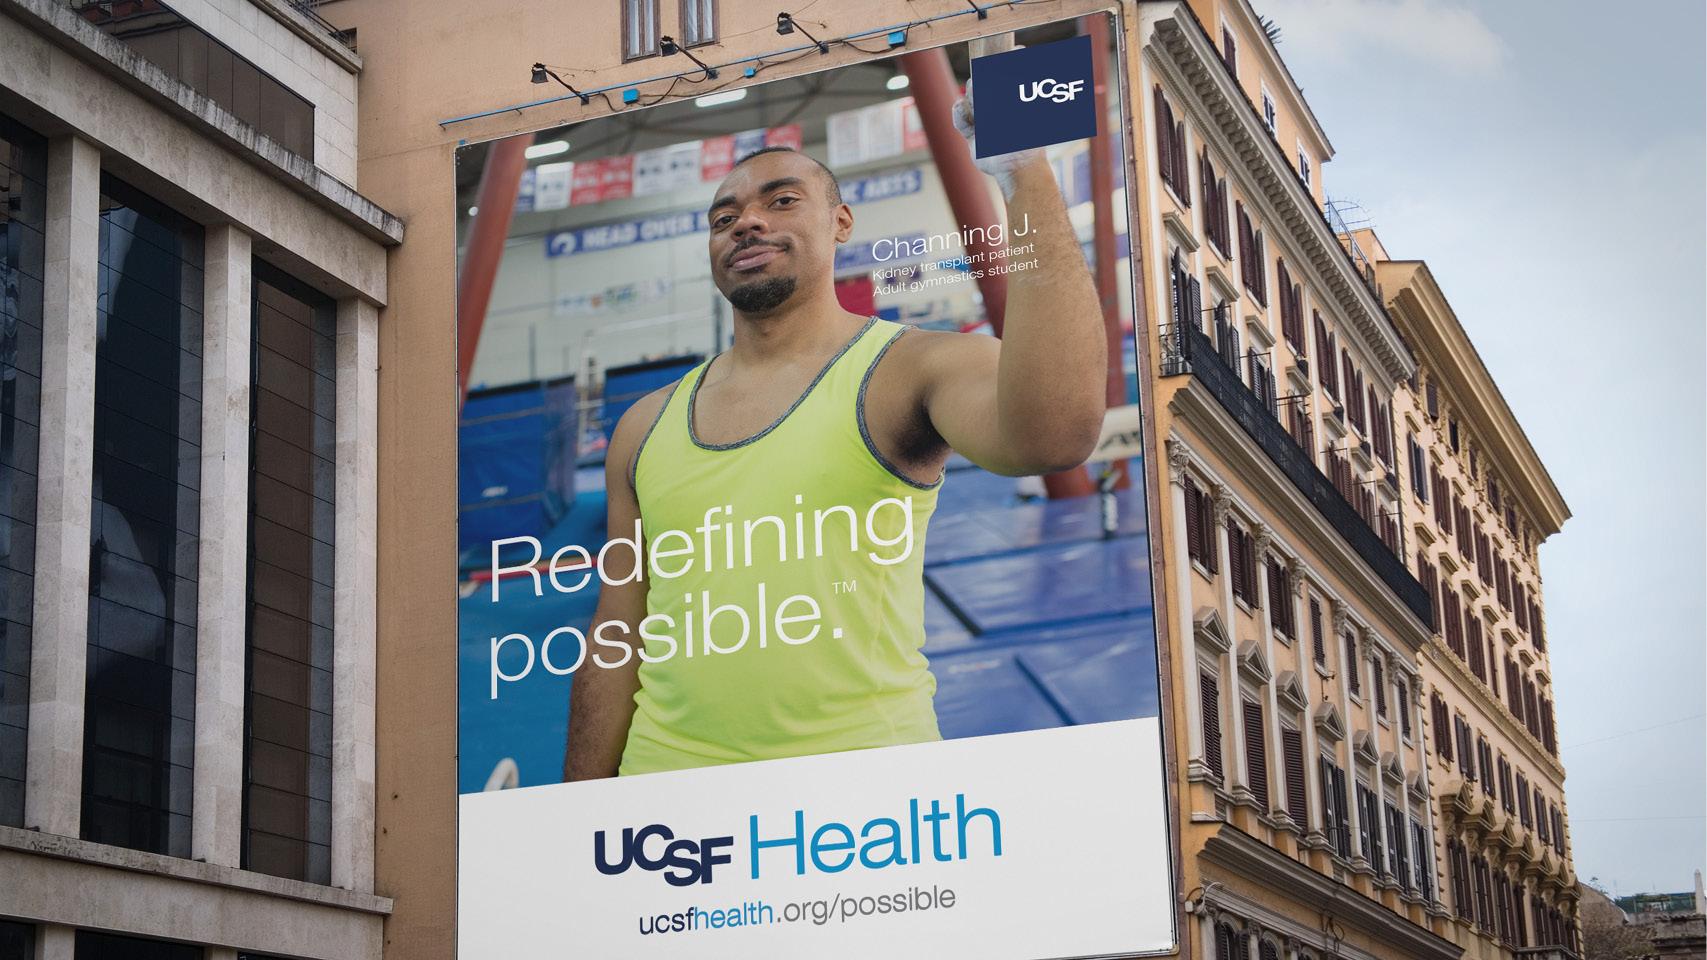 ucsf-billboard-3.jpg